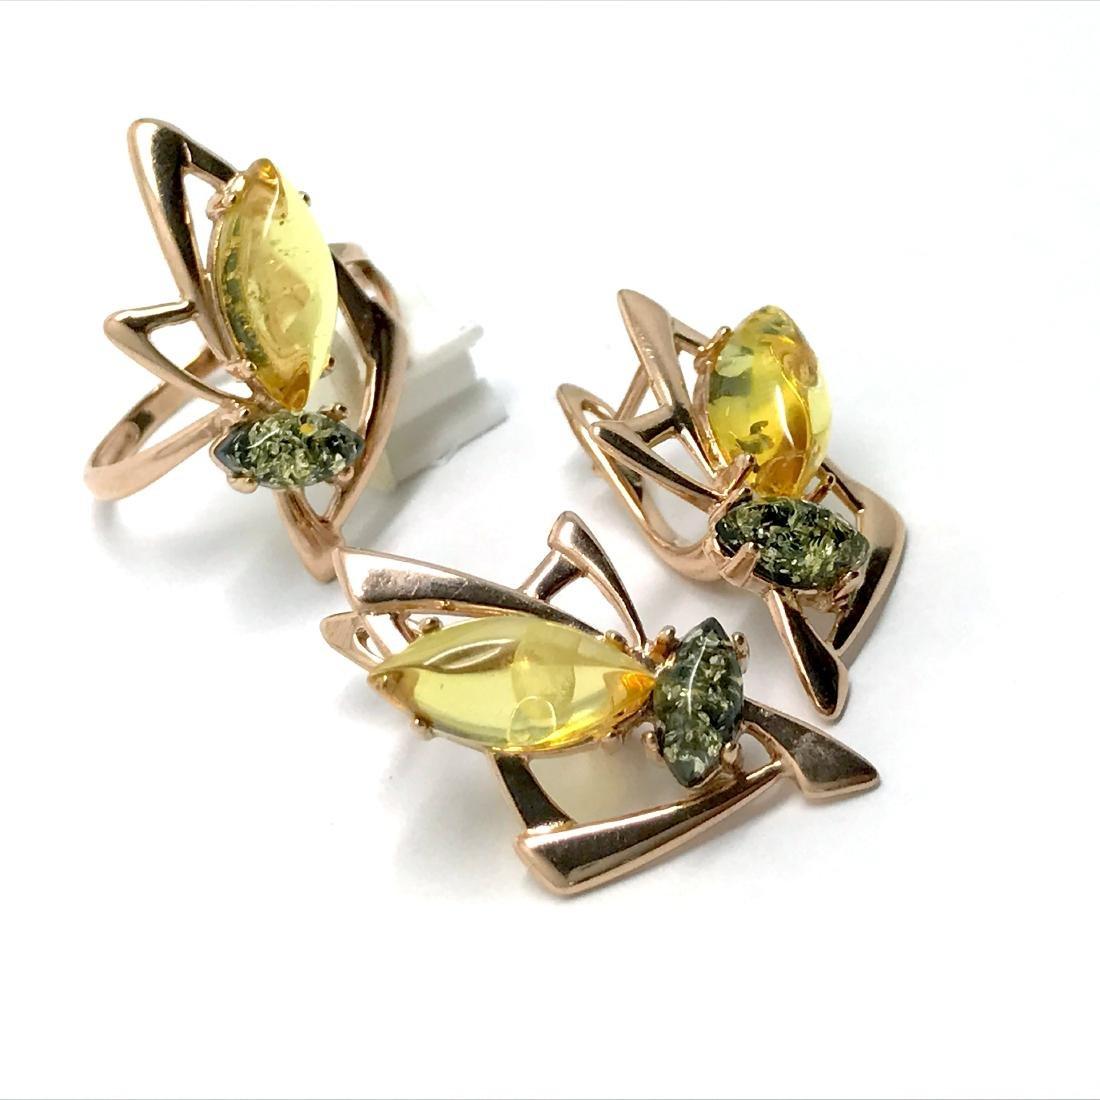 Baltic amber set Ring + Earrings Ag925 goldplated - 5